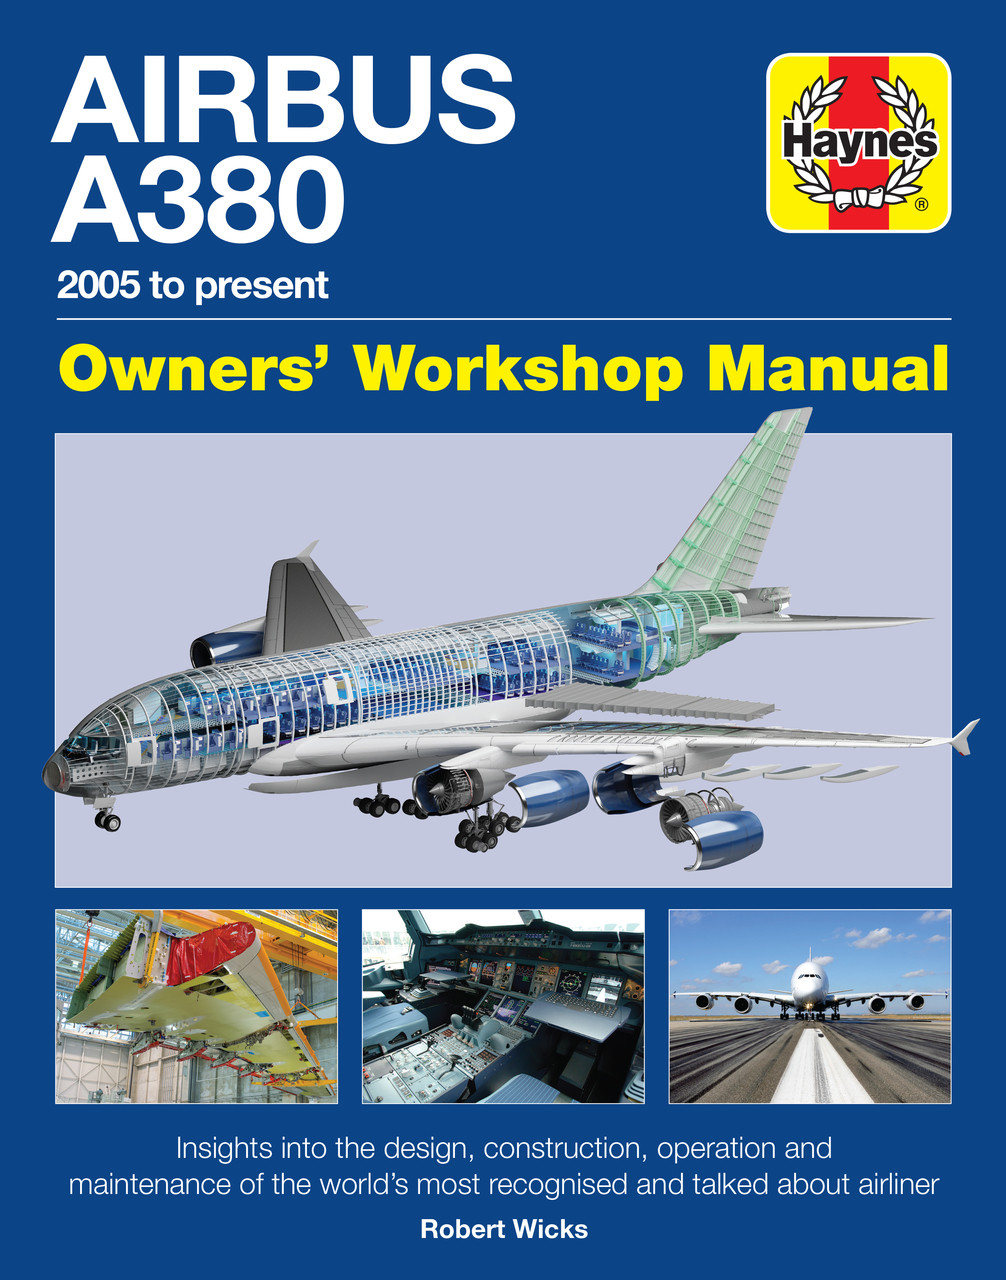 airbus a380 2005 to present owners s workshop manual rh automotobookshop com au 92F Technical Manuals M4 Carbine Technical Manual